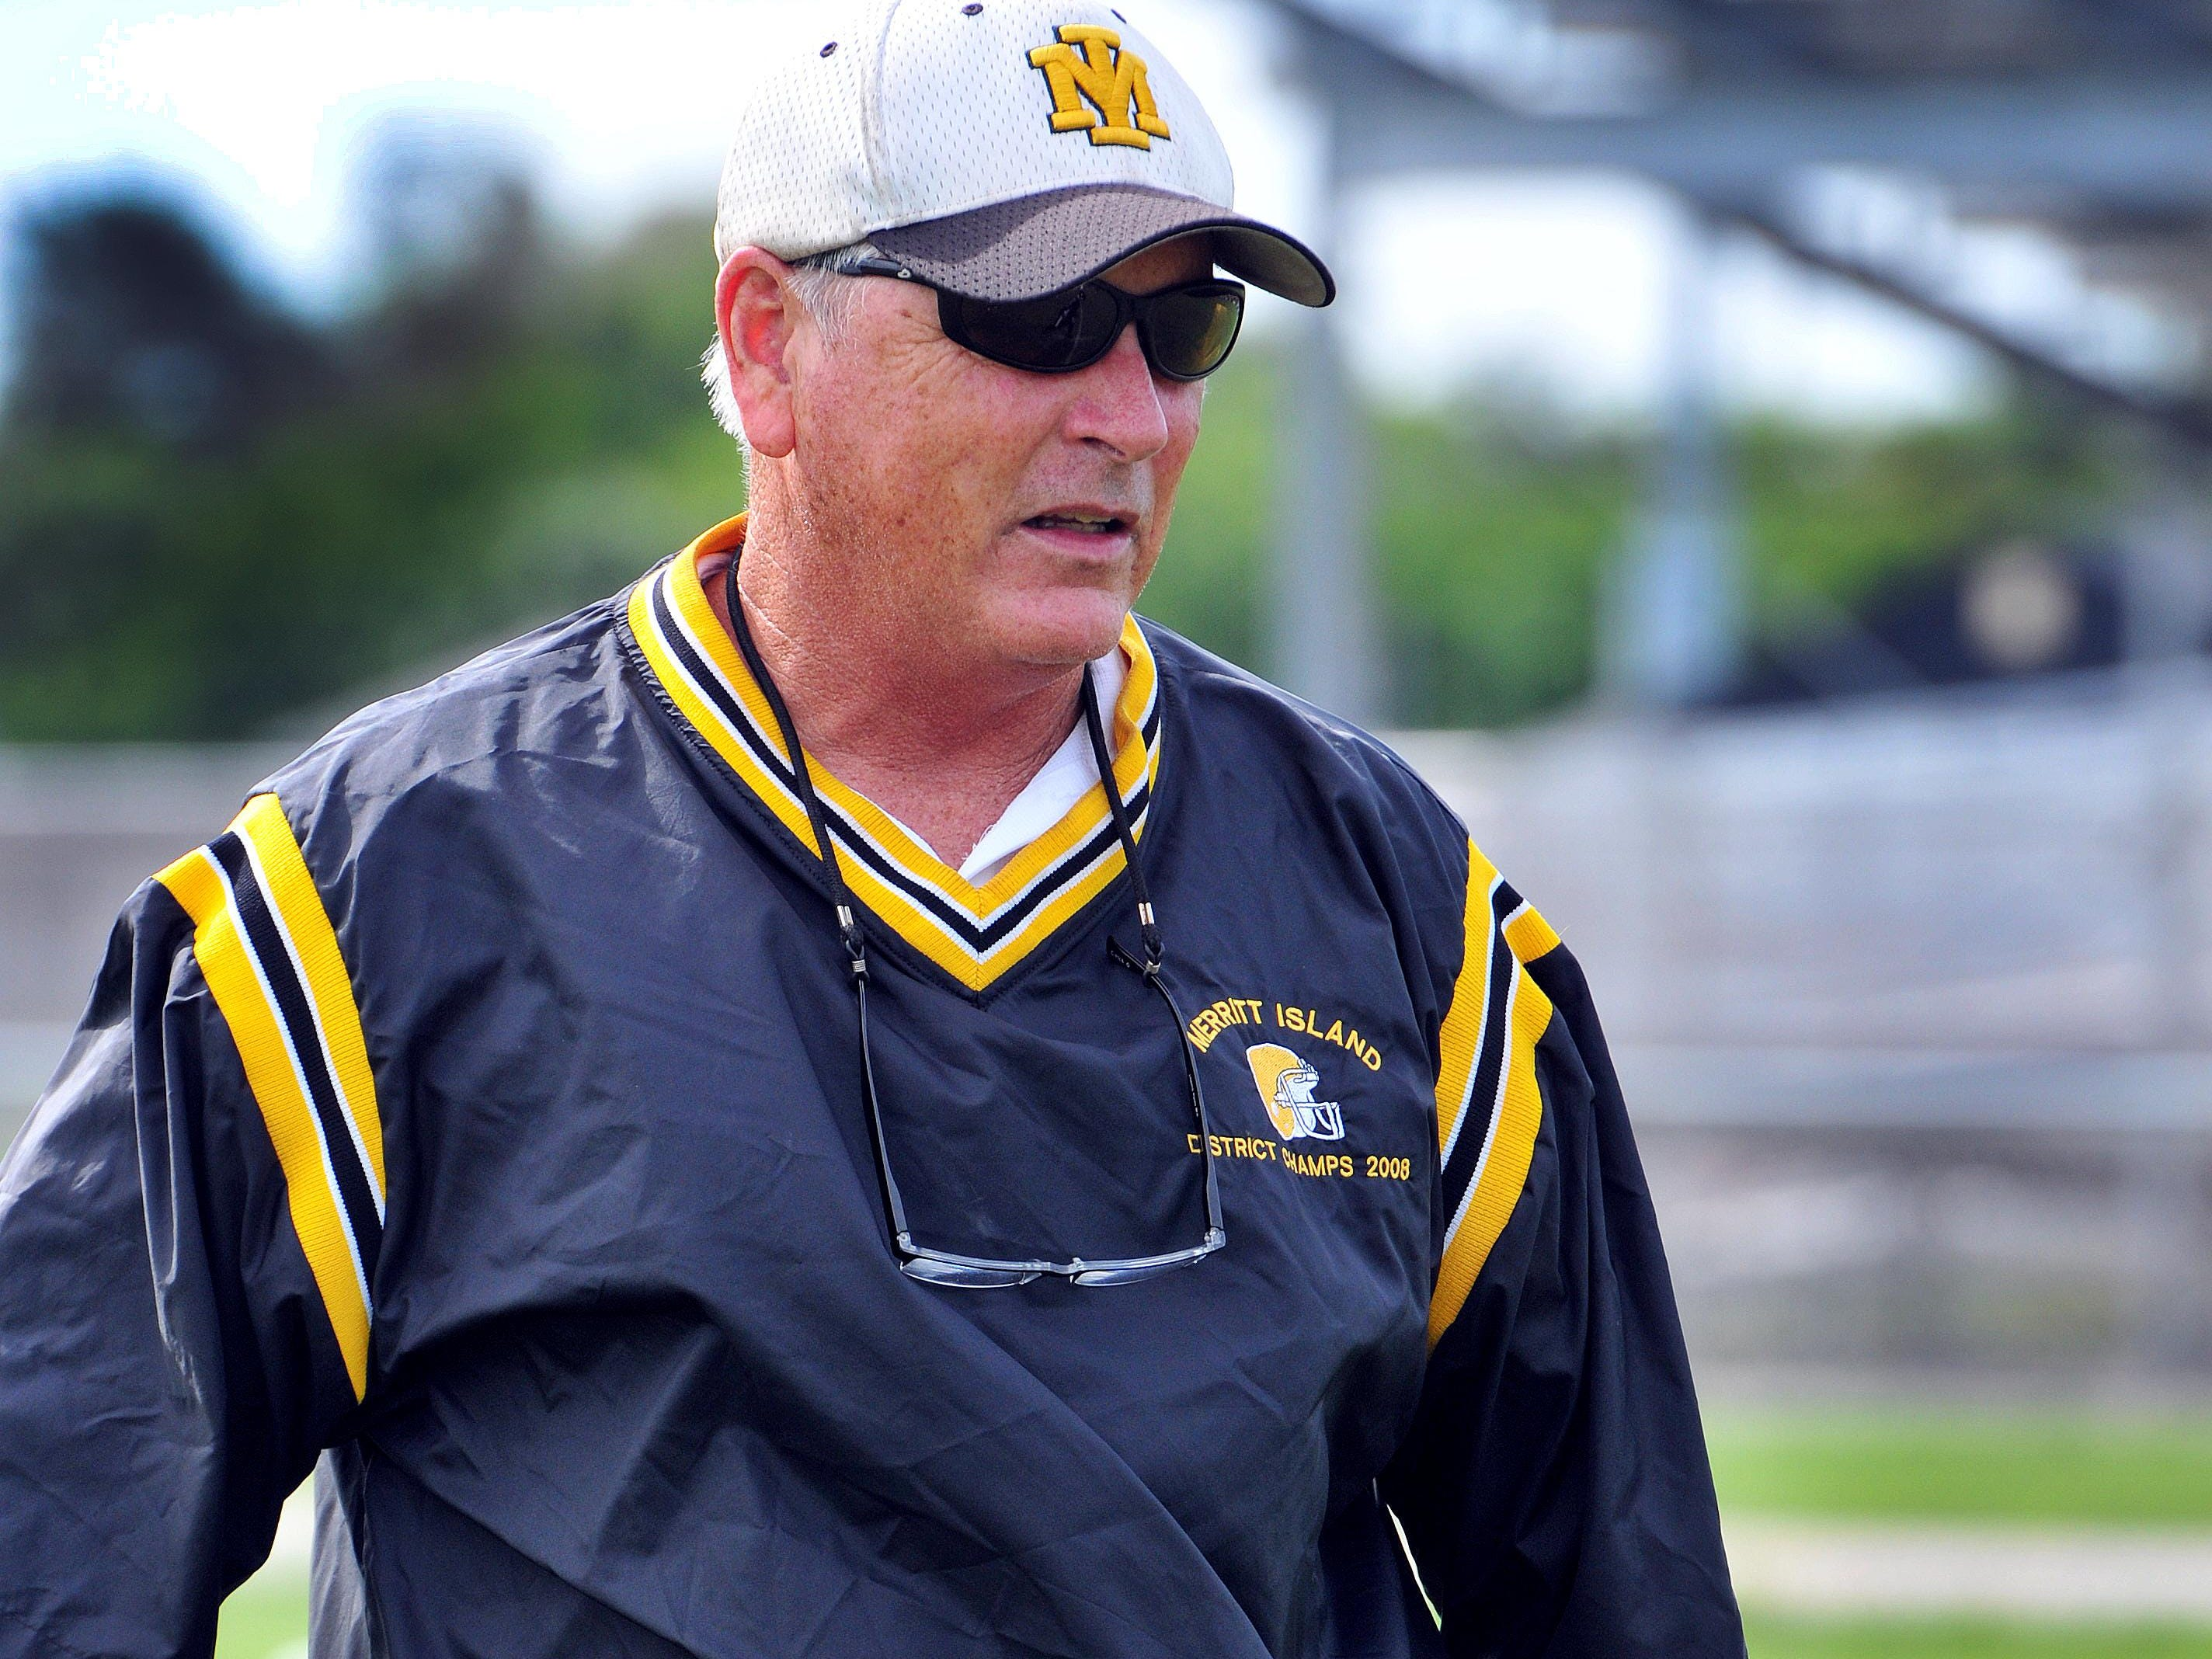 Merritt Island High head football coach and A.D. Jeff McLean